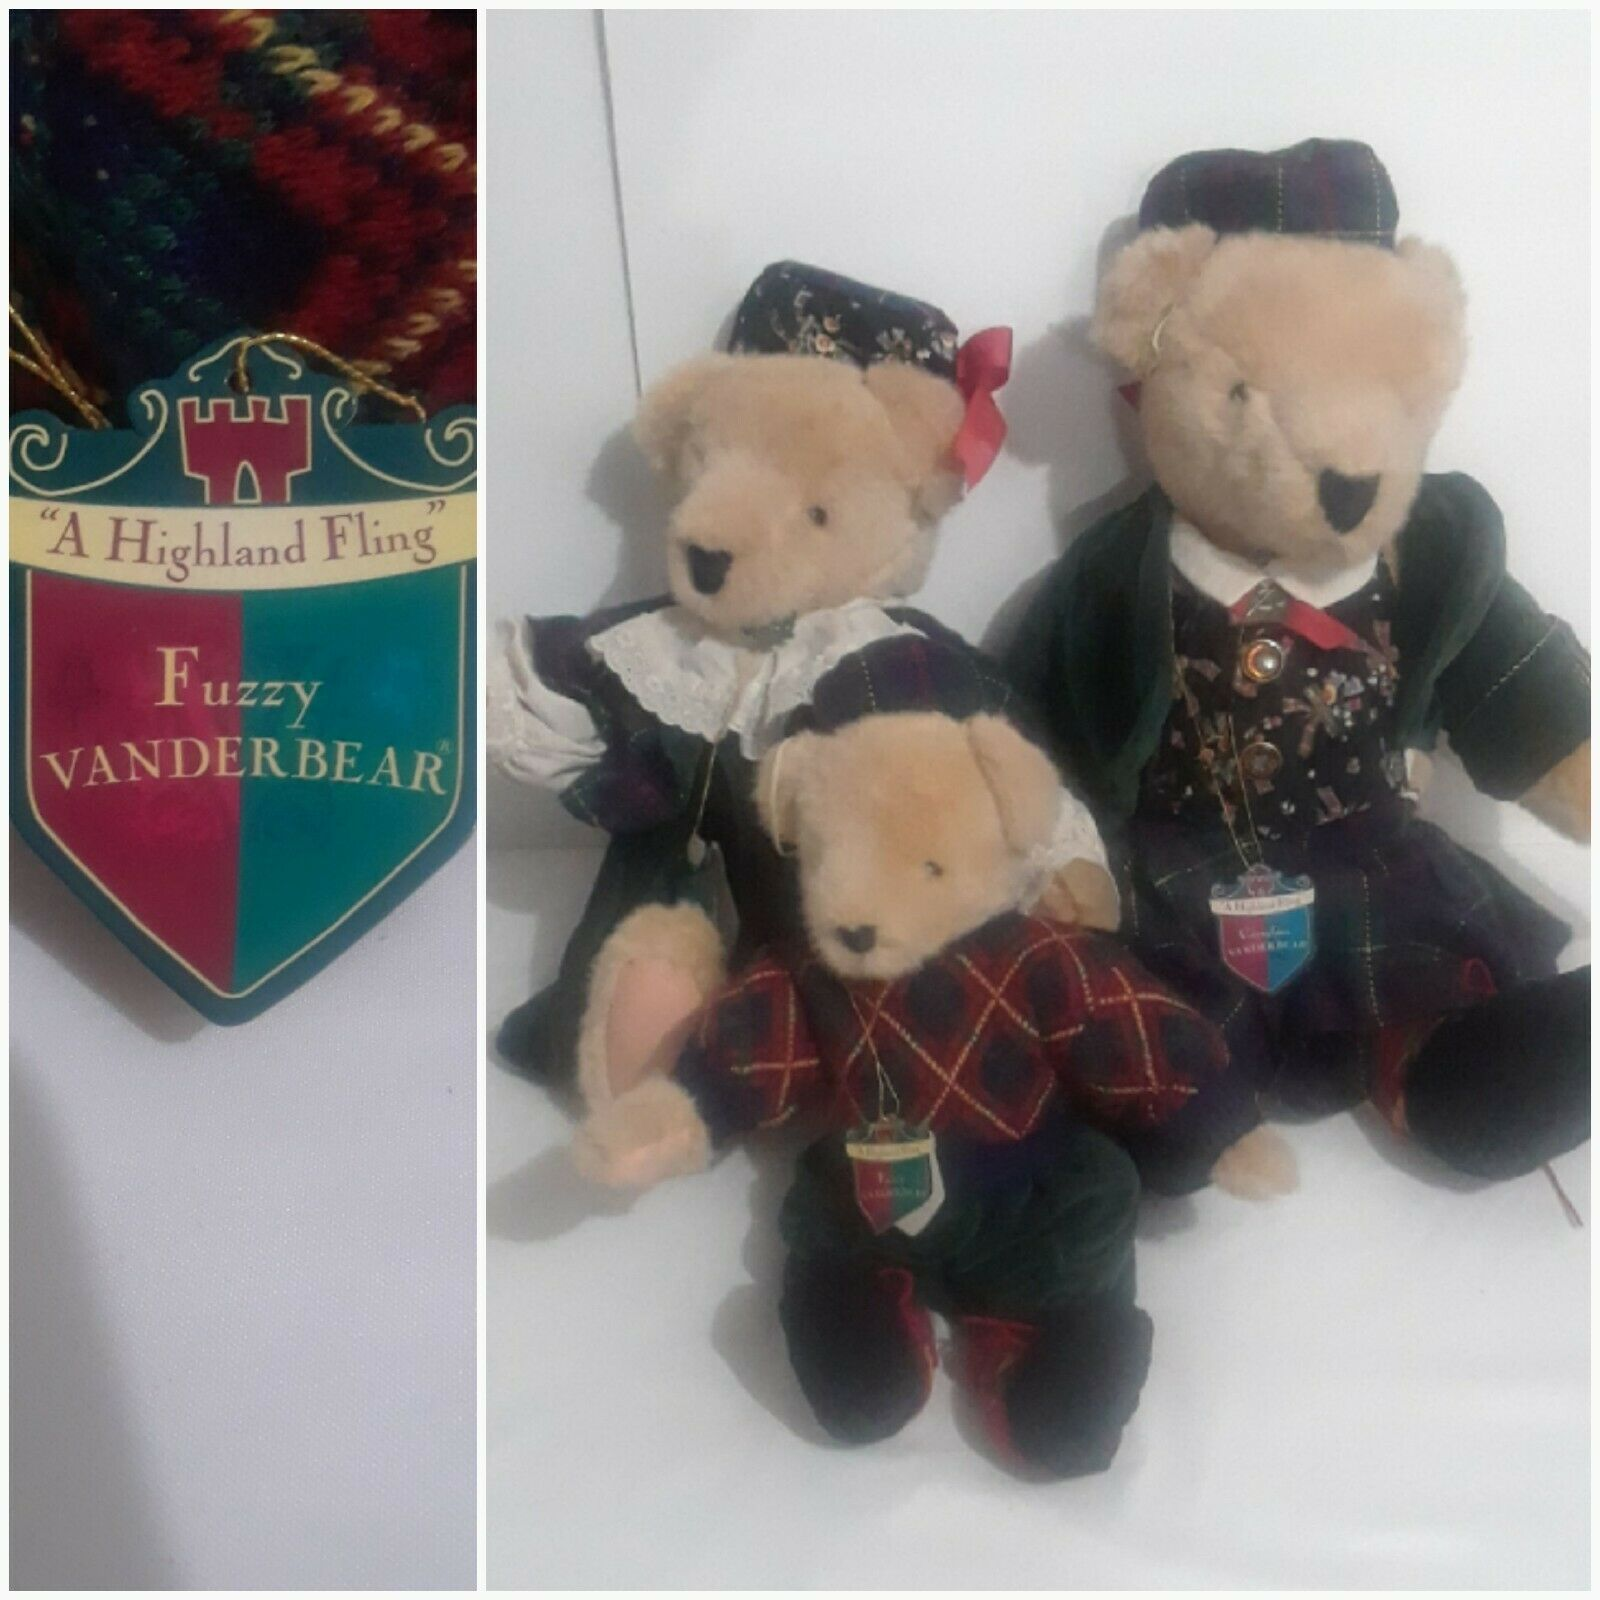 Vtg Vanderbear Plush Family,  A hochland Fling  Masse of 3 Collectable Teddybears